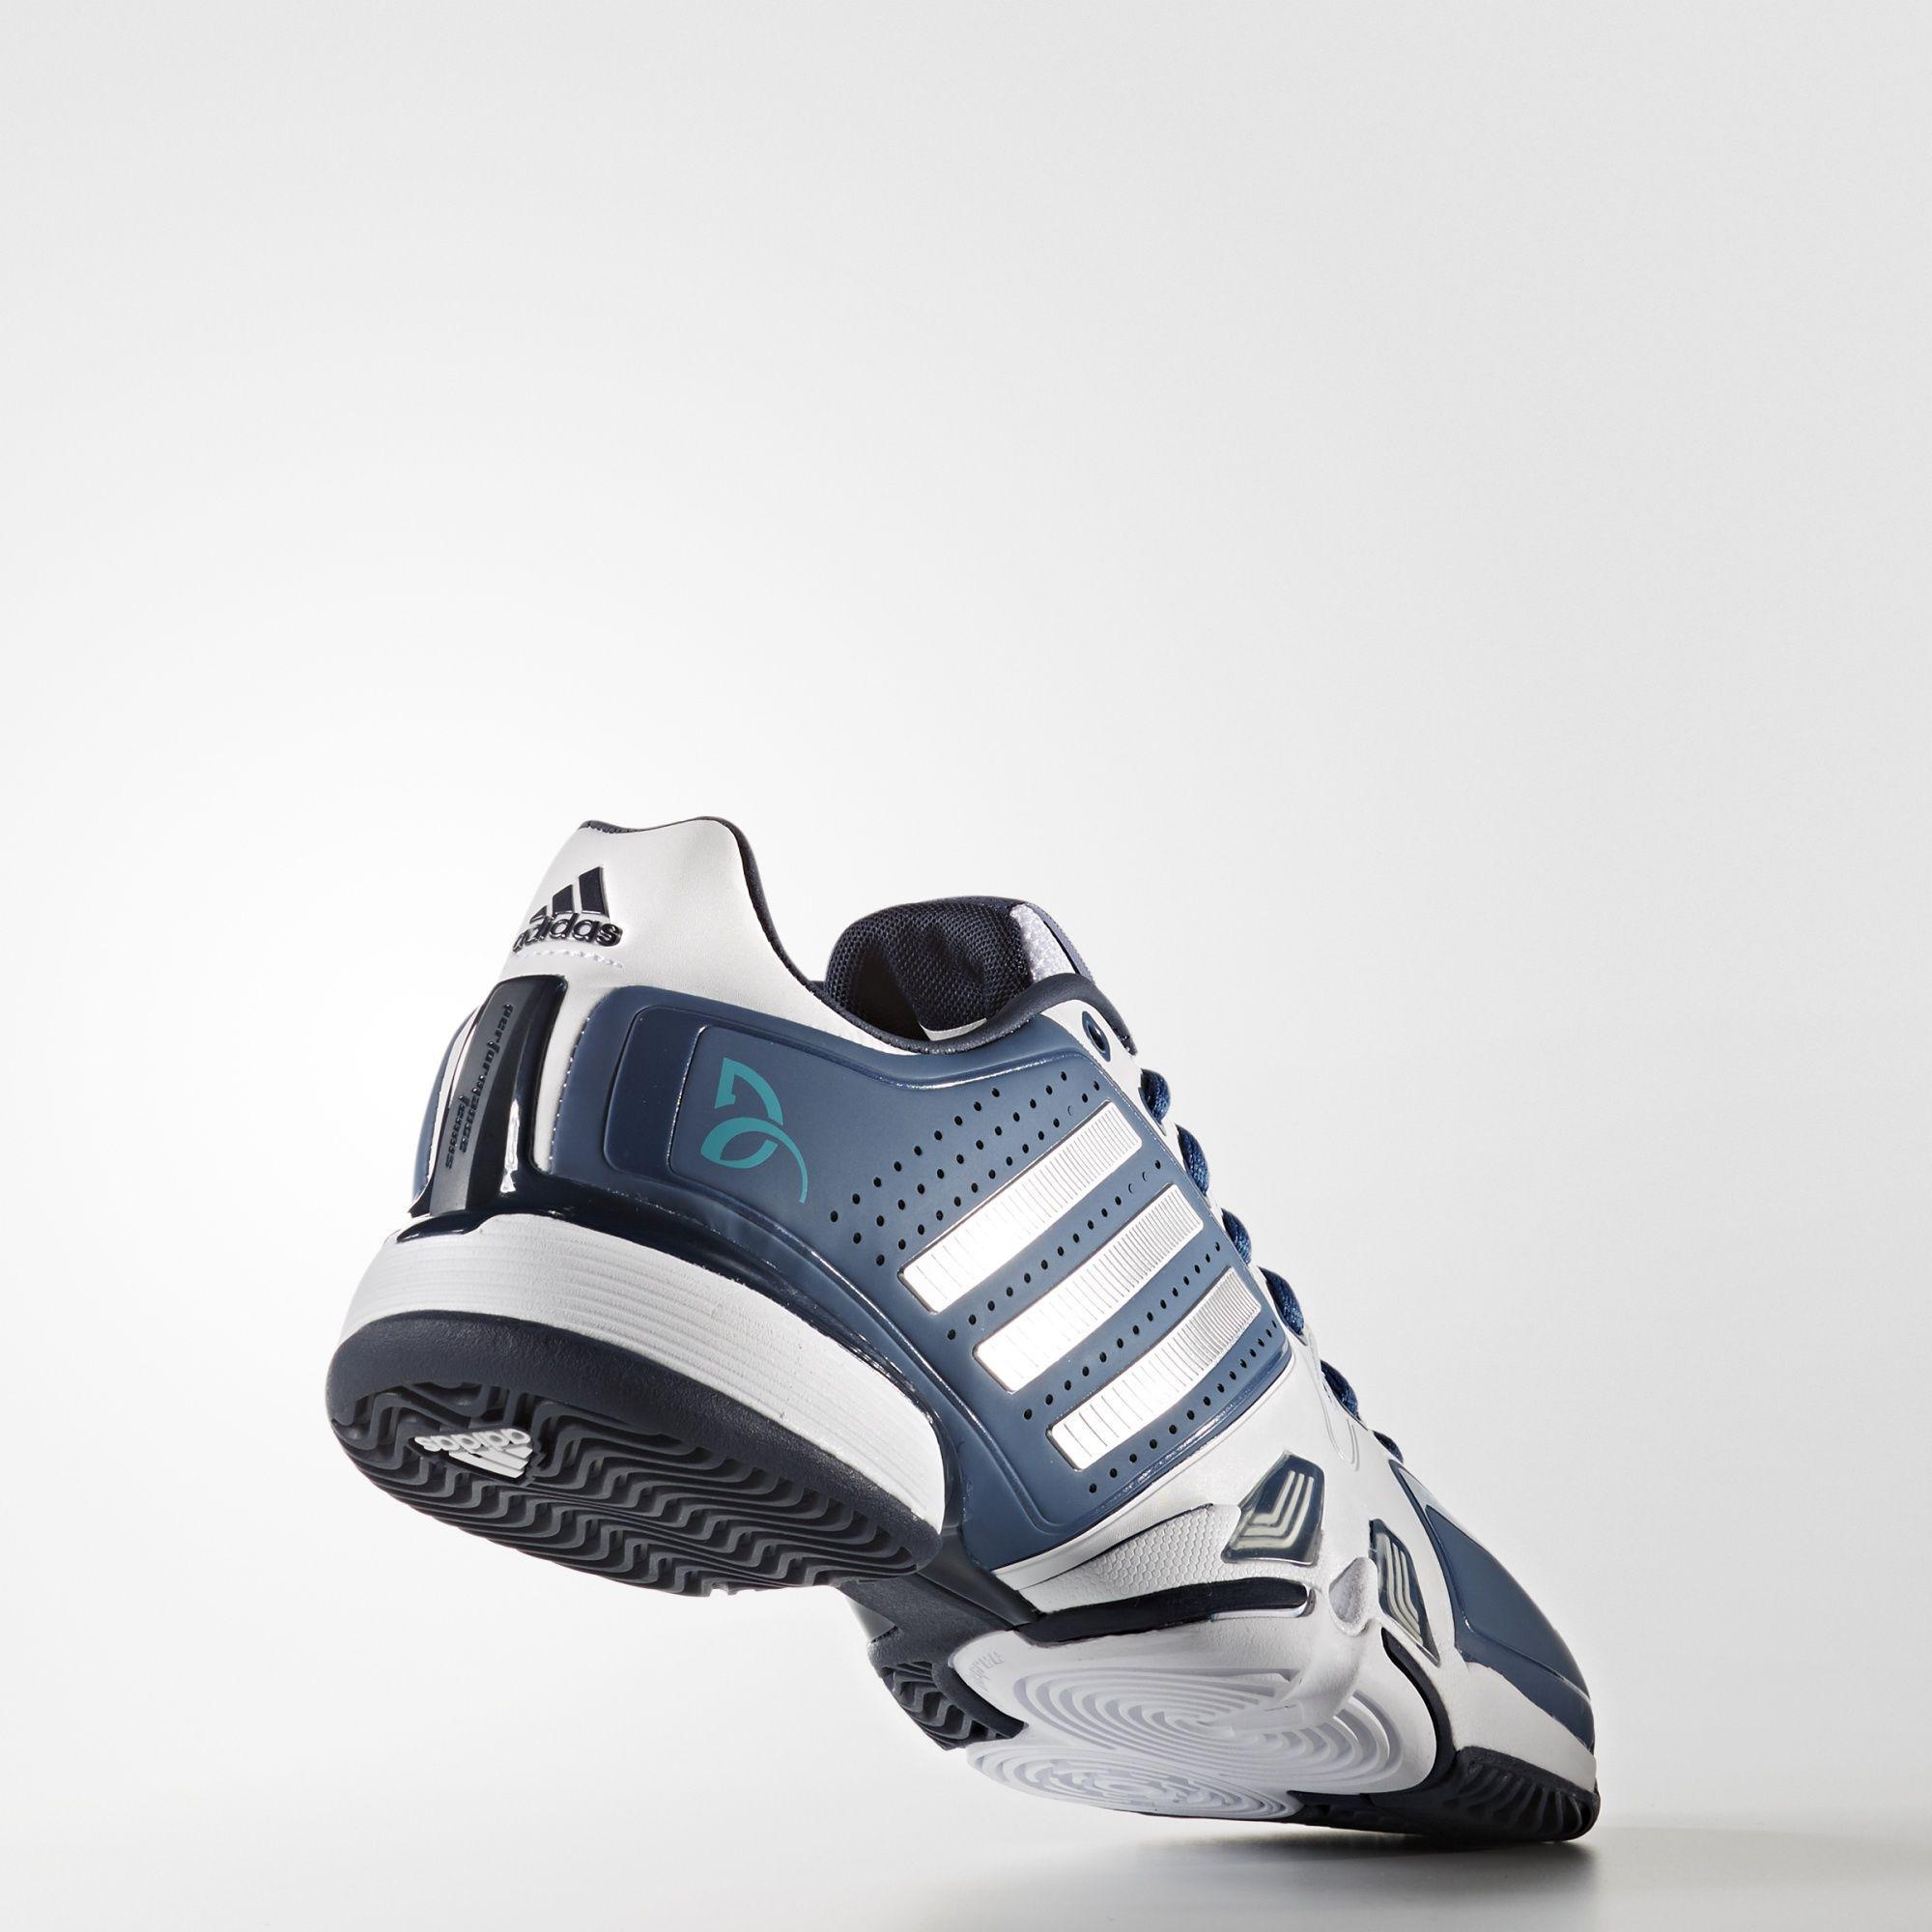 2aa9484df7f Adidas Mens Barricade Novak Pro Tennis Shoes - White - Tennisnuts.com